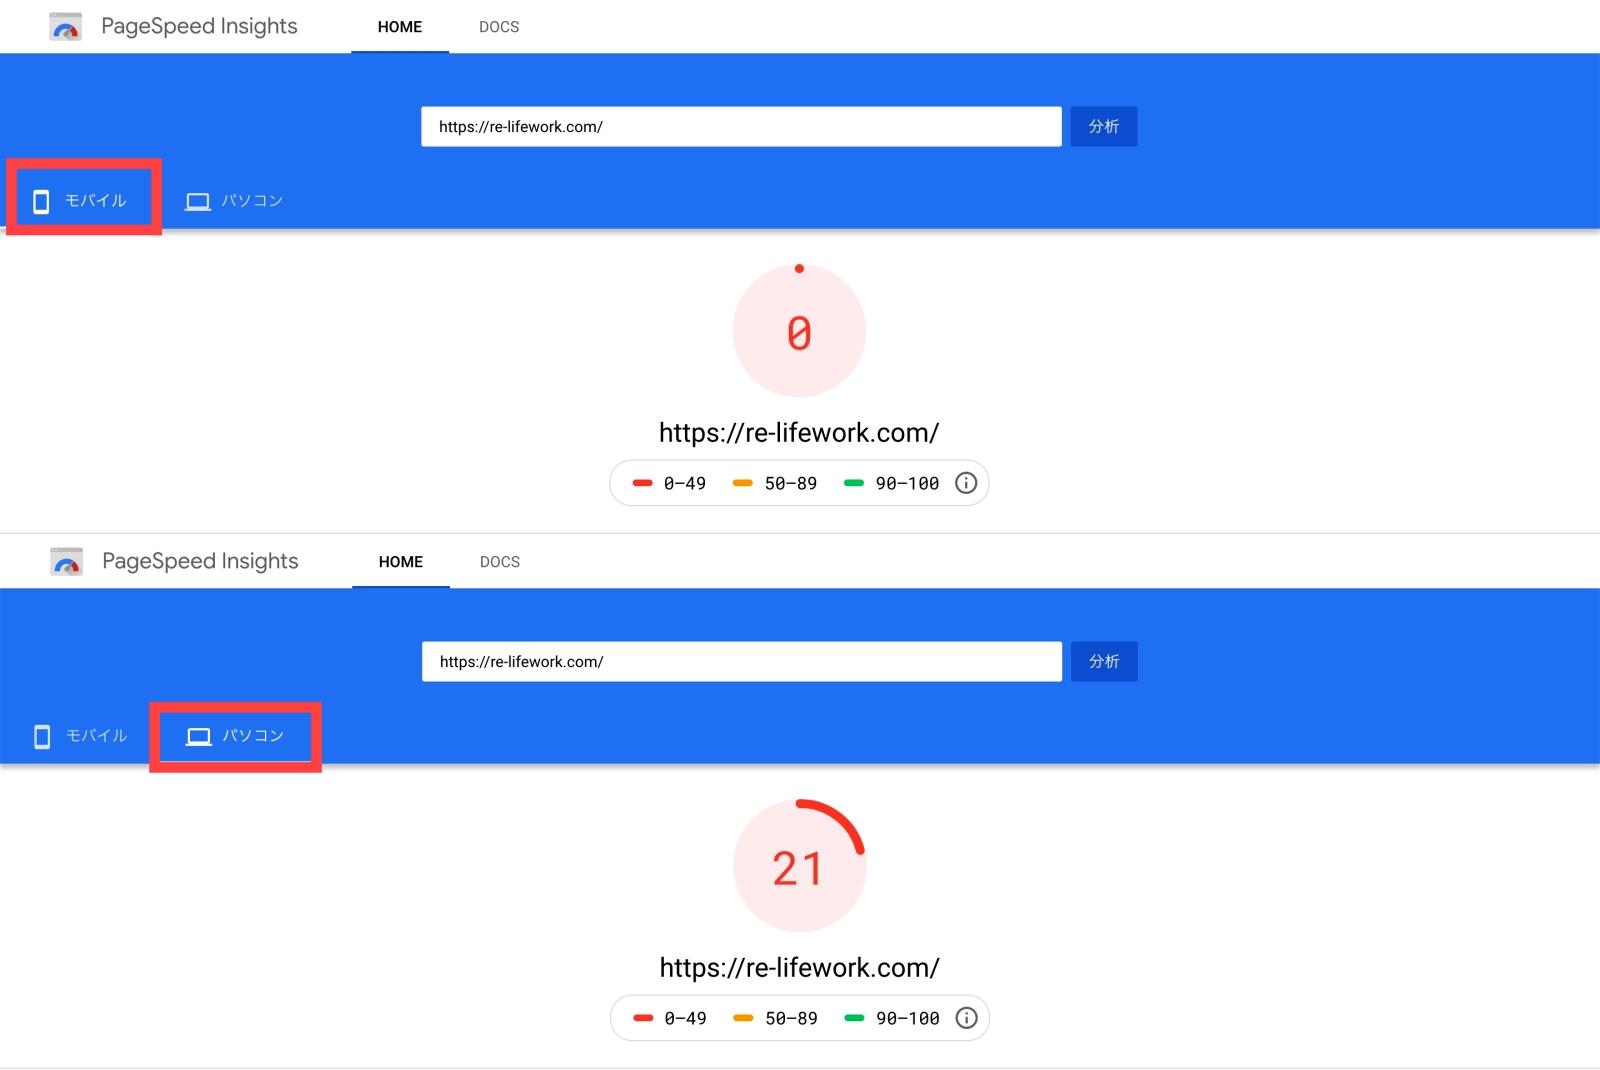 pagespeed before 1 - 【これだけでOK】AutoptimizeとCache Enablerの設定でサイト高速化する方法